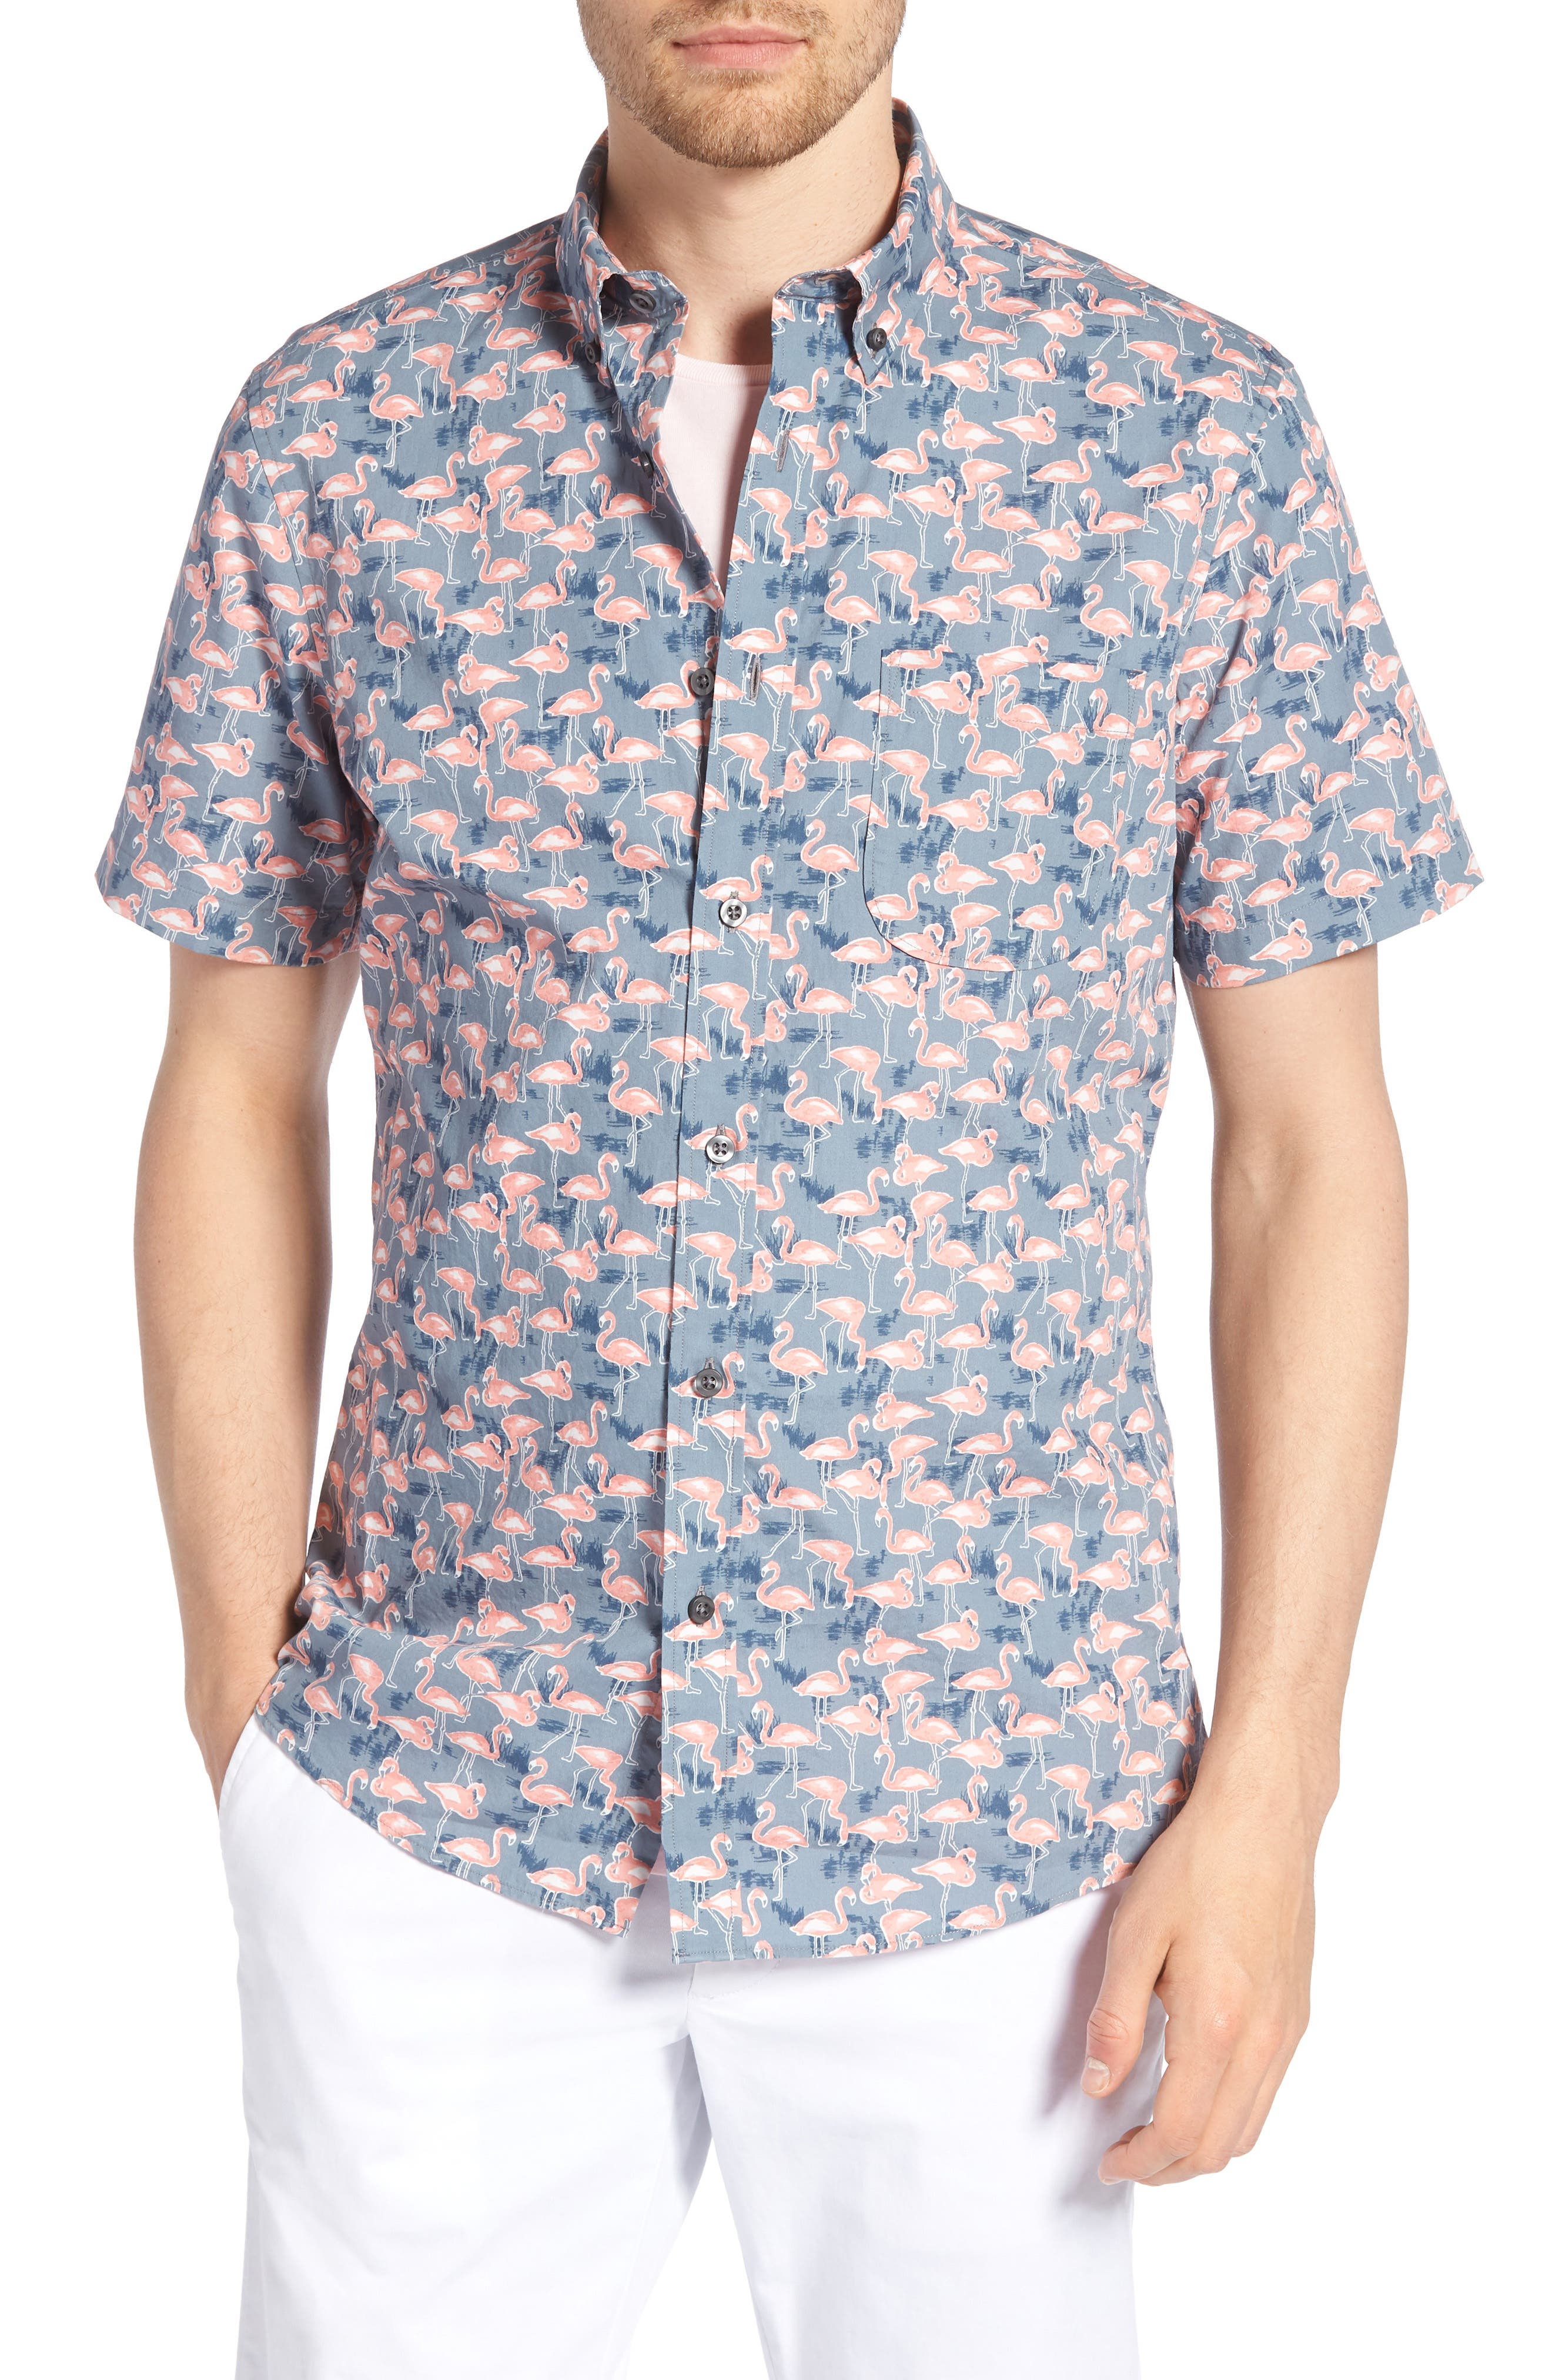 Trim Fit Print Short Sleeve Sport Shirt,                             Main thumbnail 1, color,                             GREY GRISALLE PINK FLAMINGOS